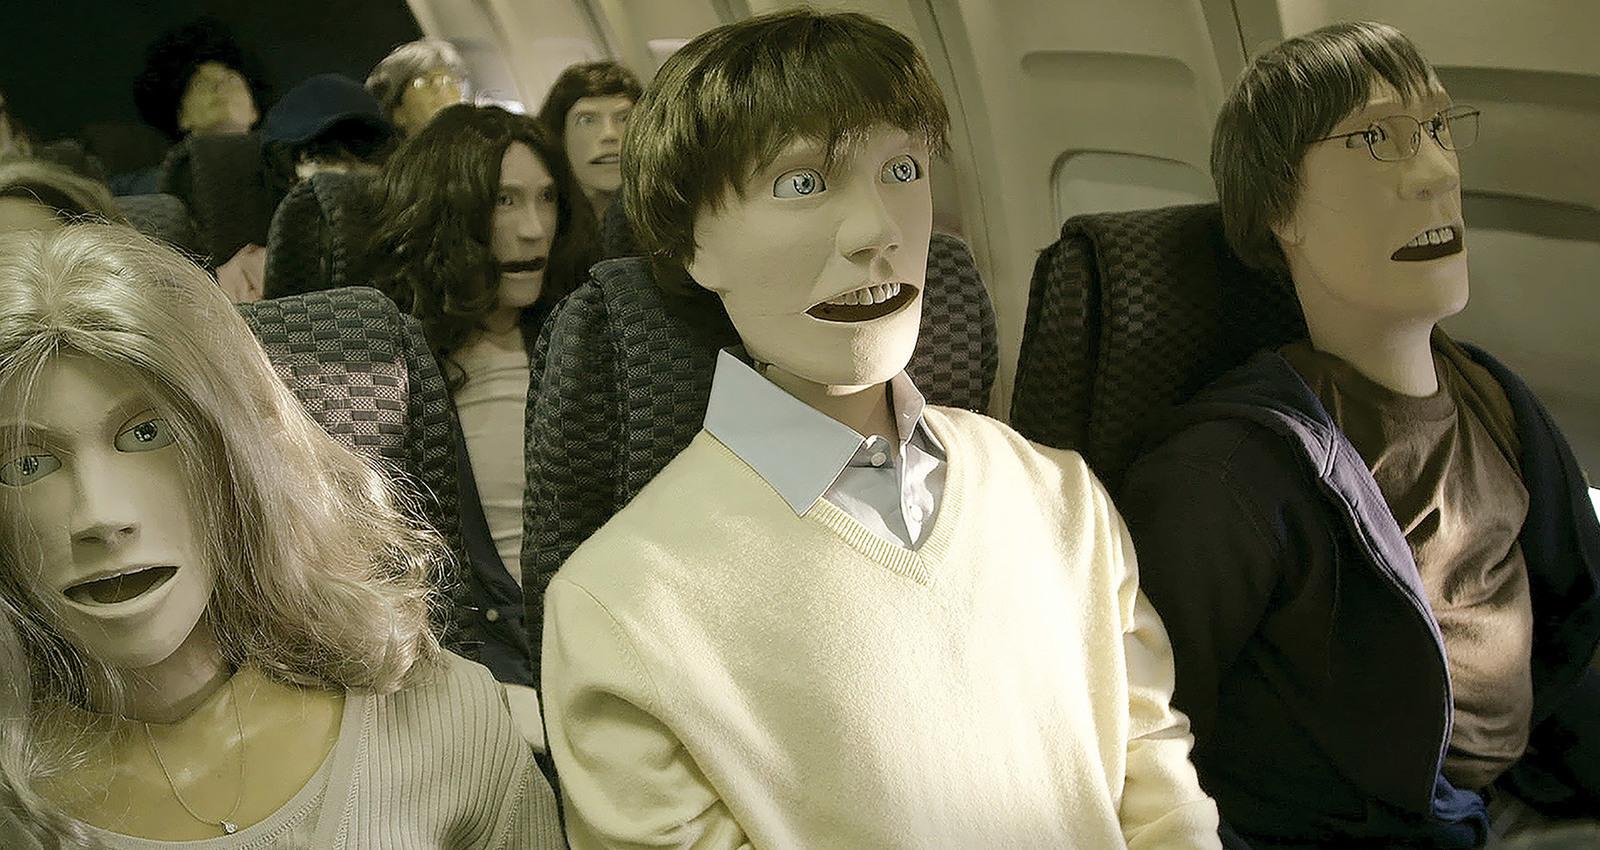 BLAH Airlines